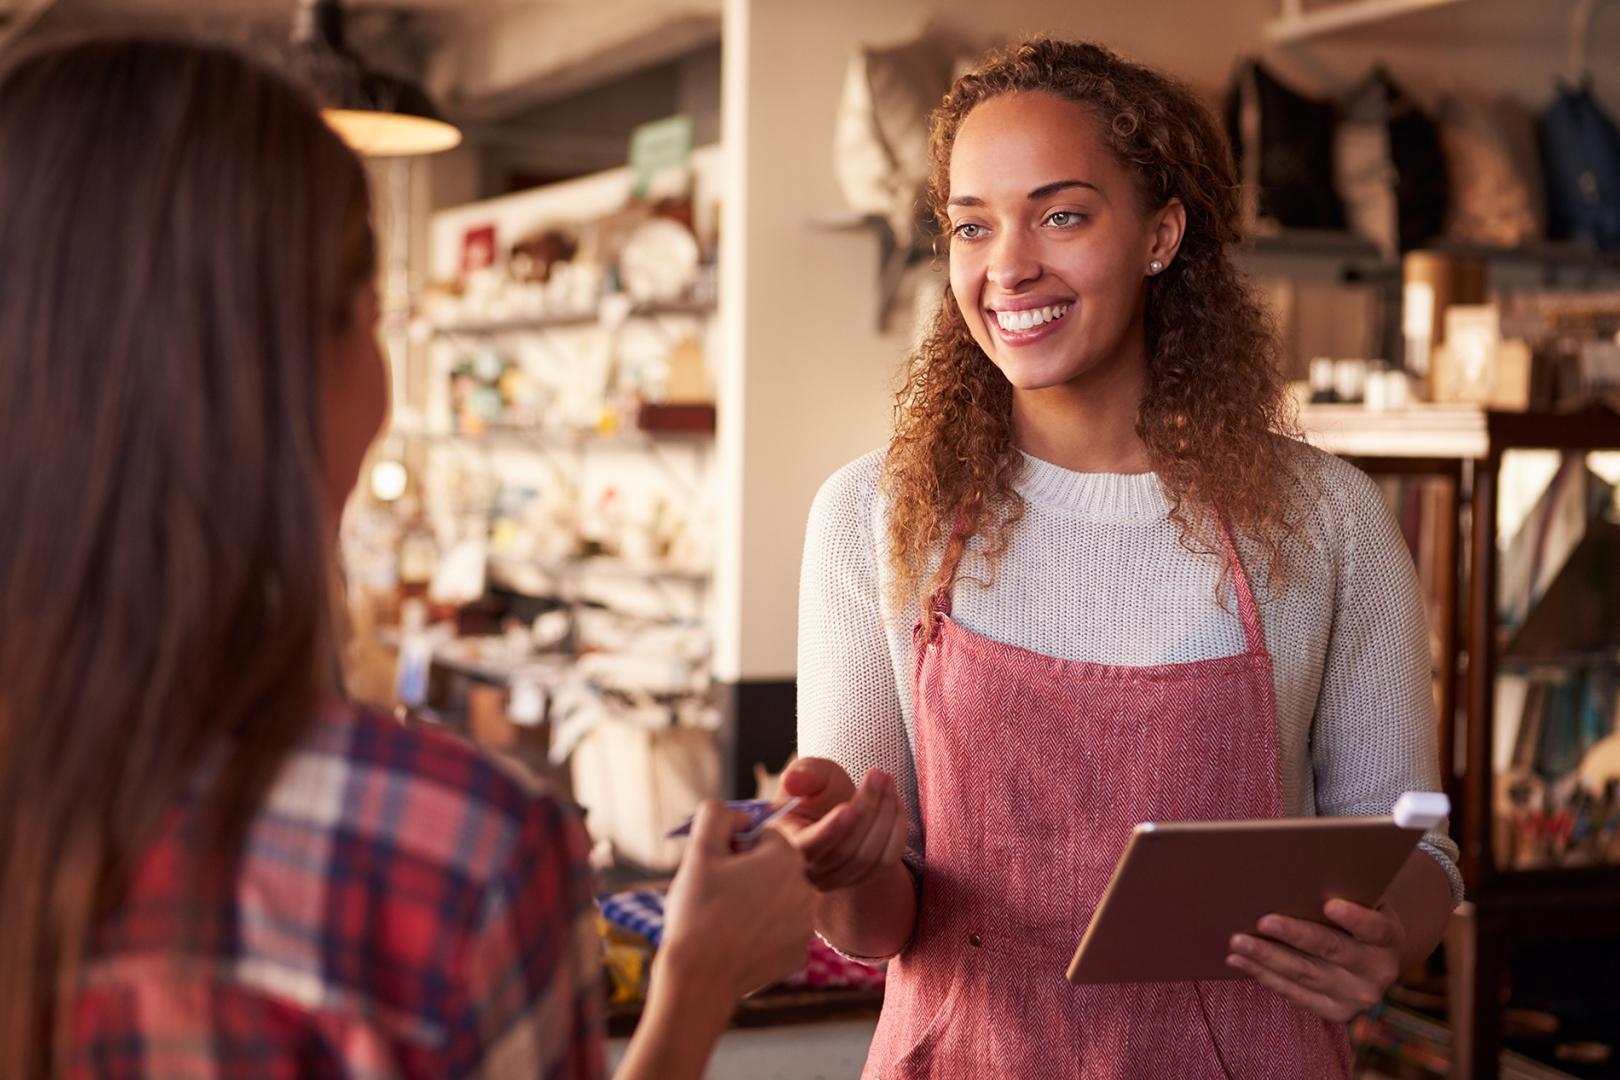 loyal customer purchasing goods at retailer